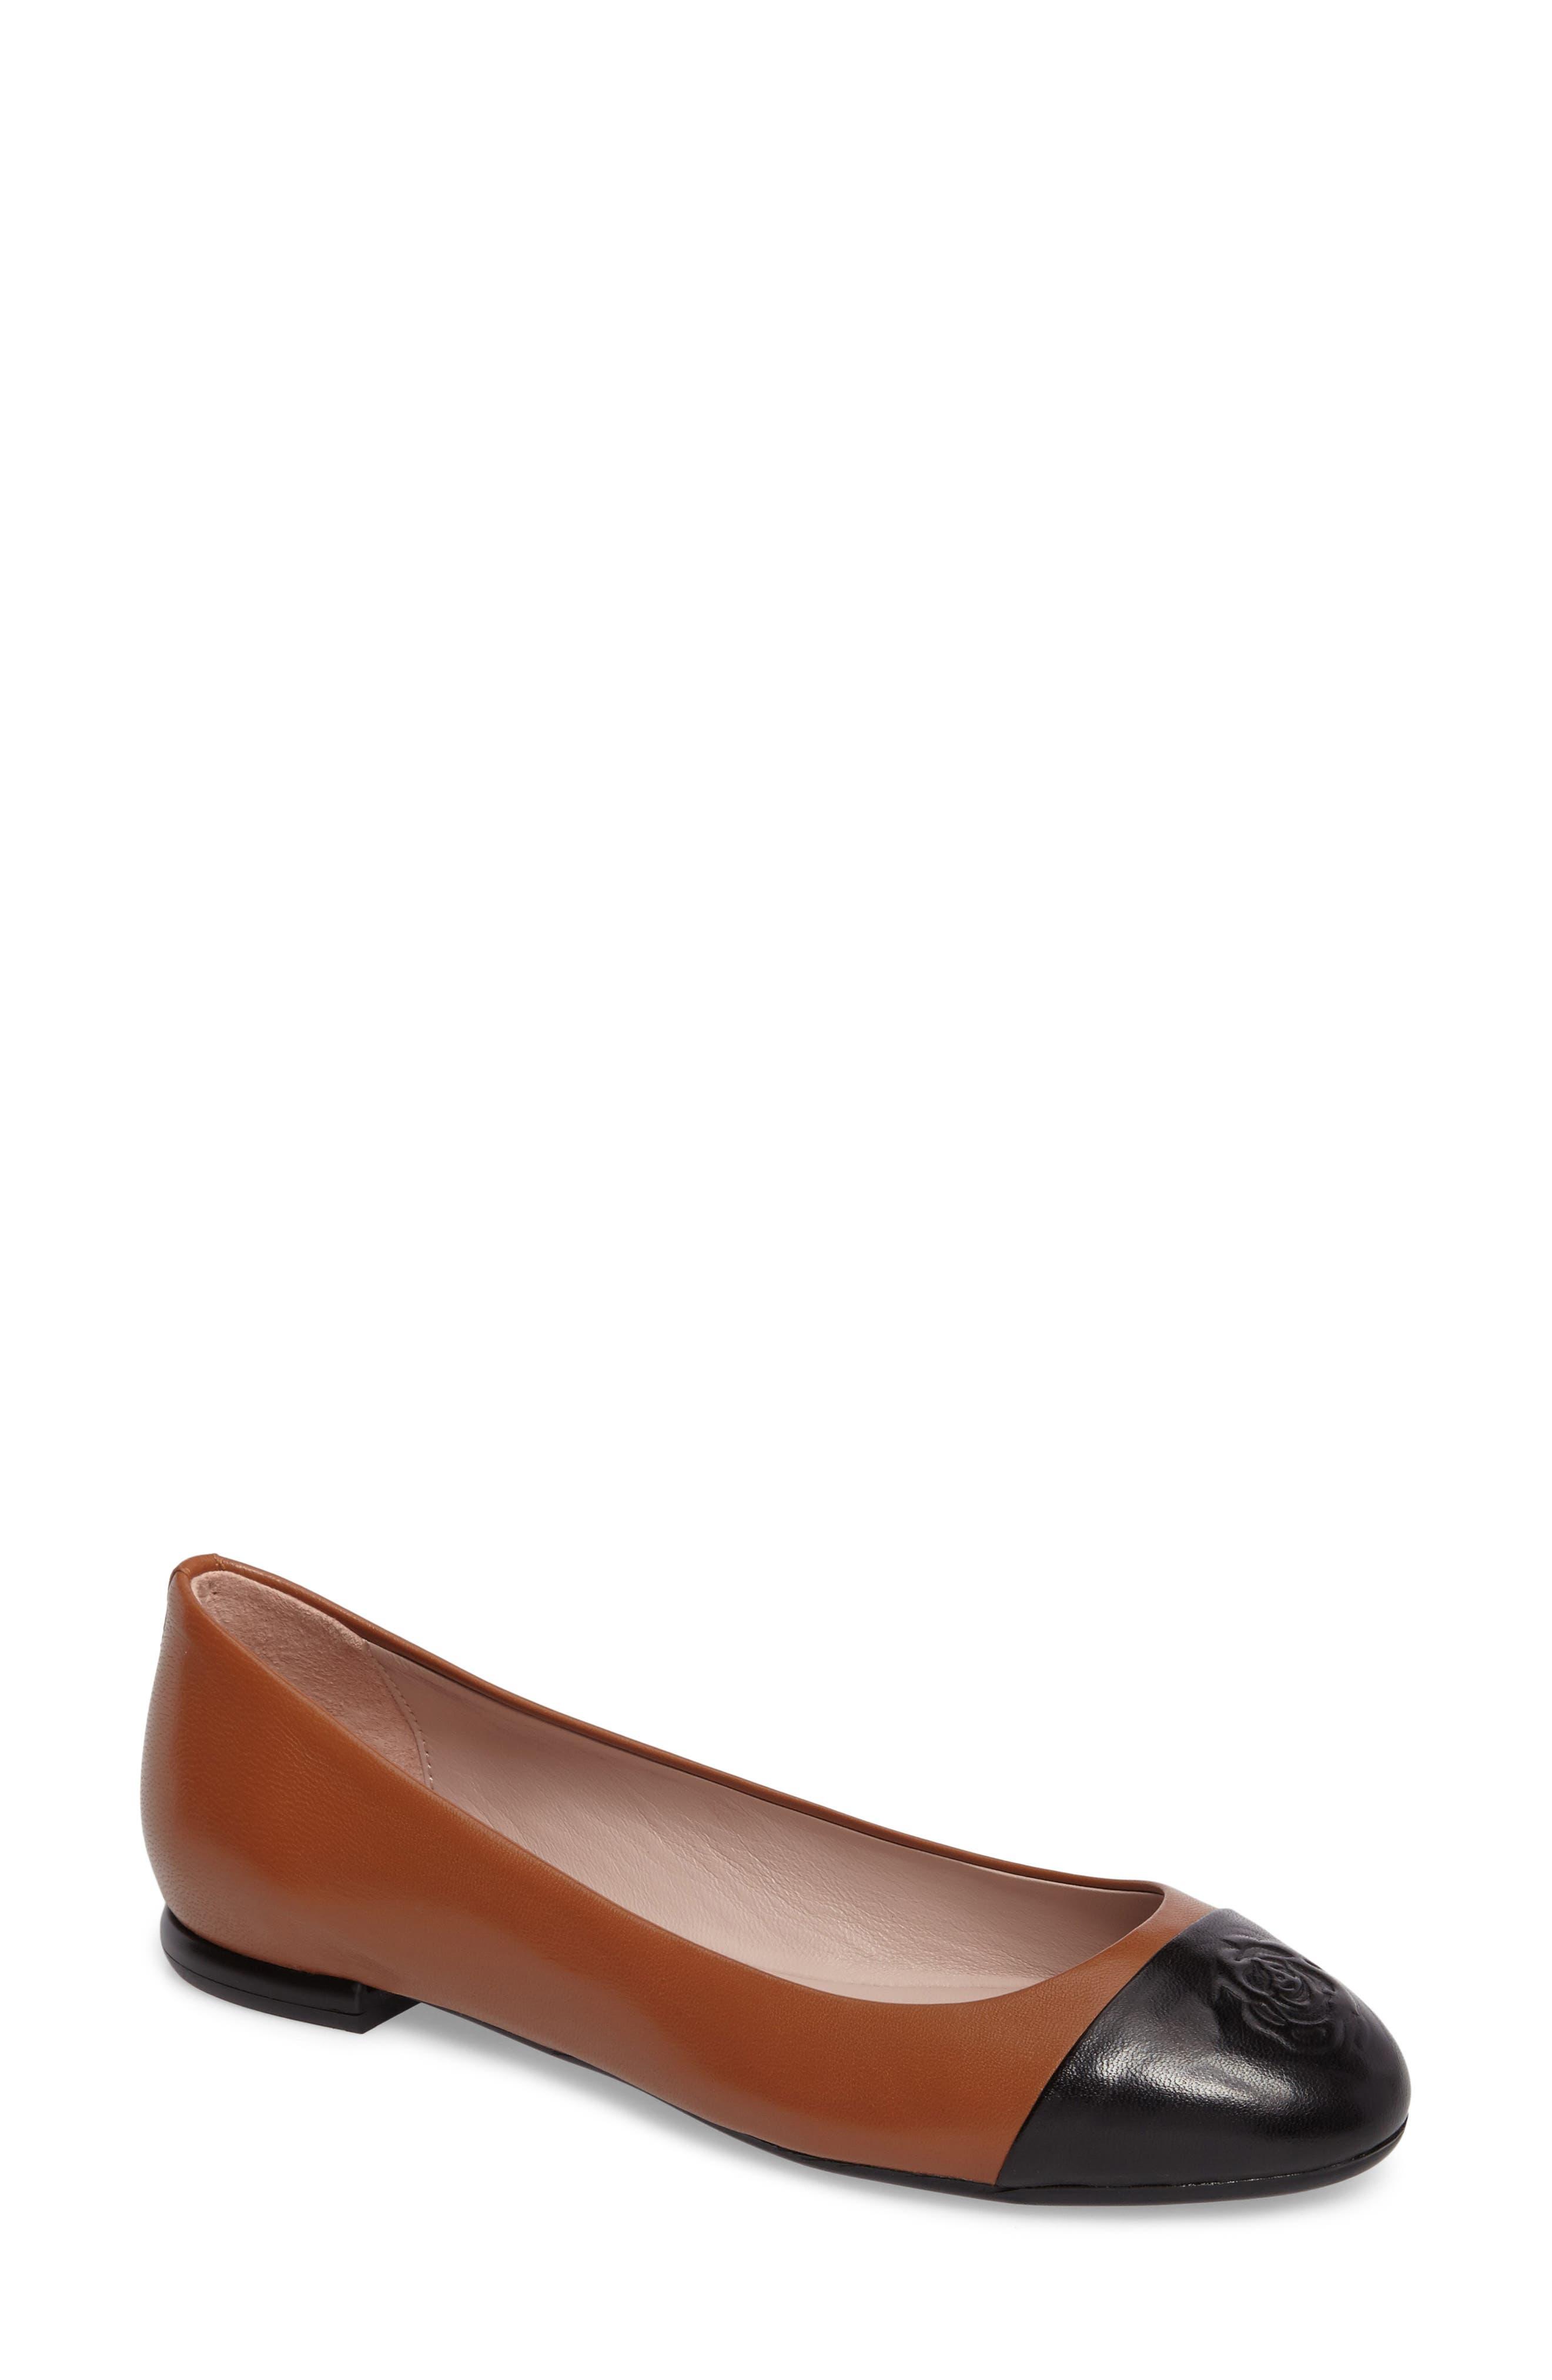 Rosa Ballet Flat,                         Main,                         color, Tan Leather